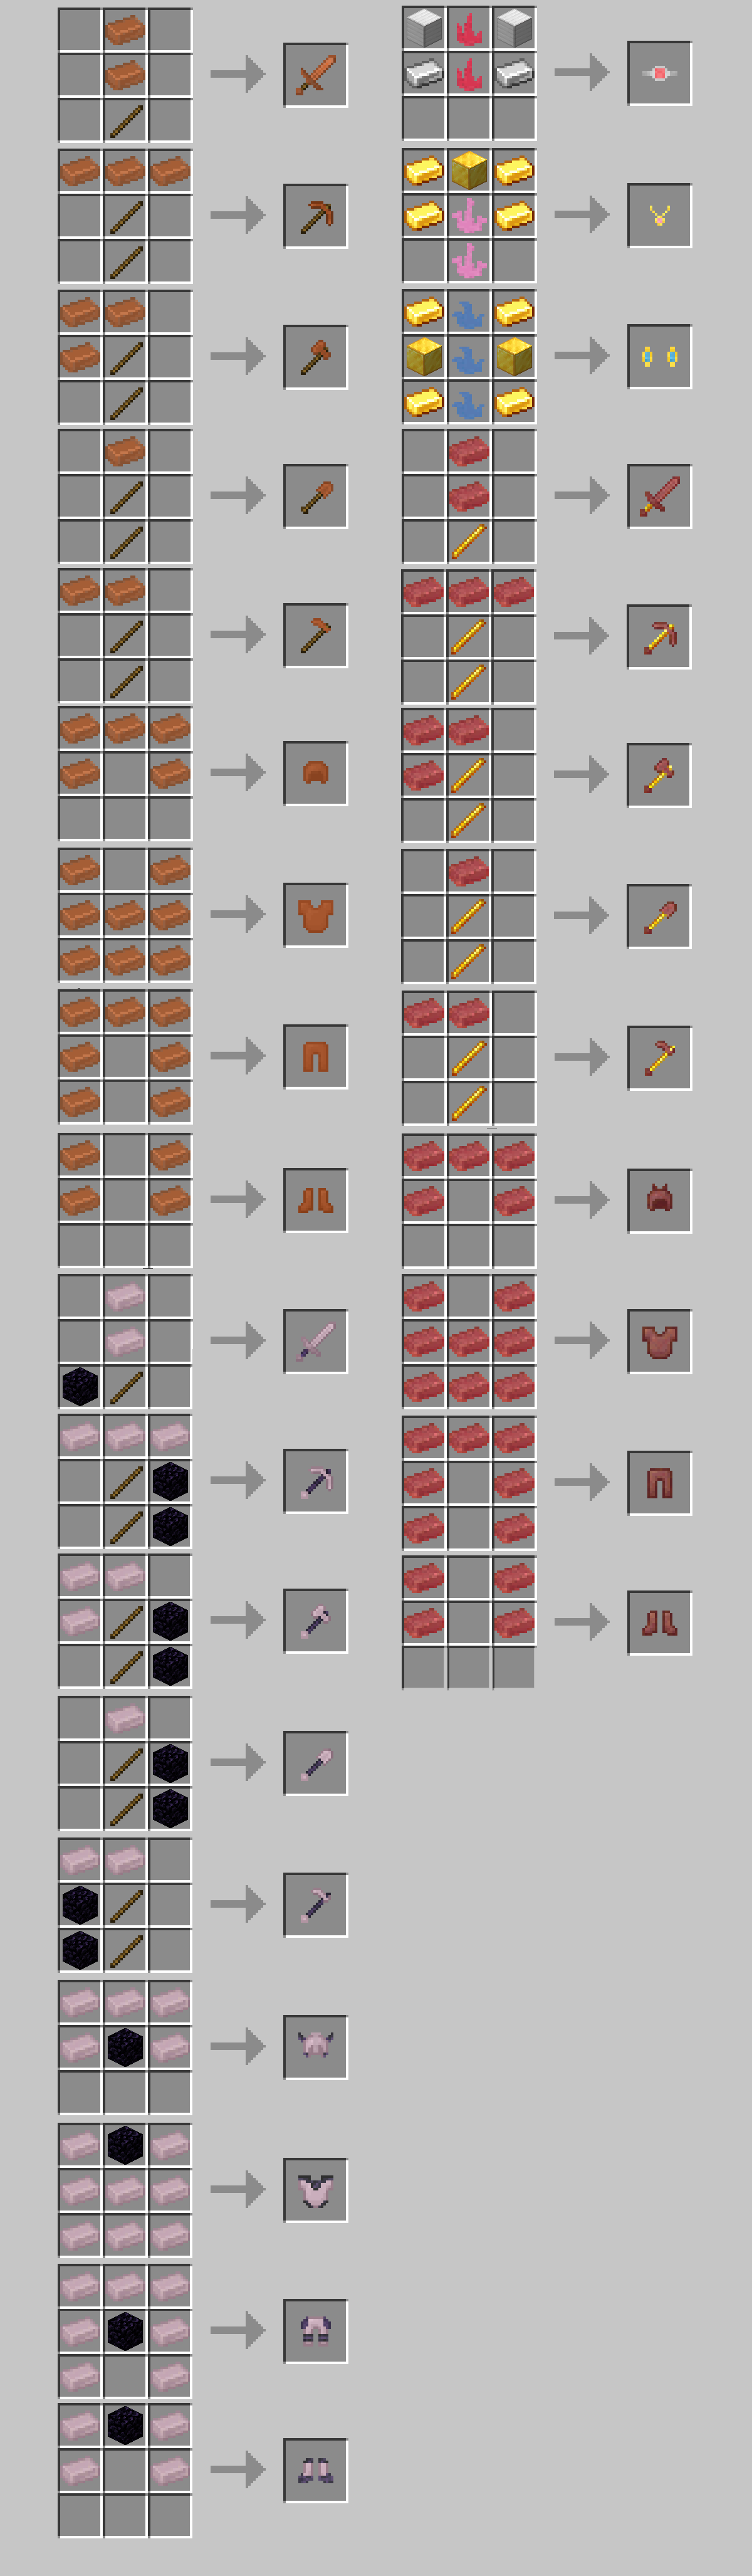 ++Ores 1.16.5 Minecraft Mod